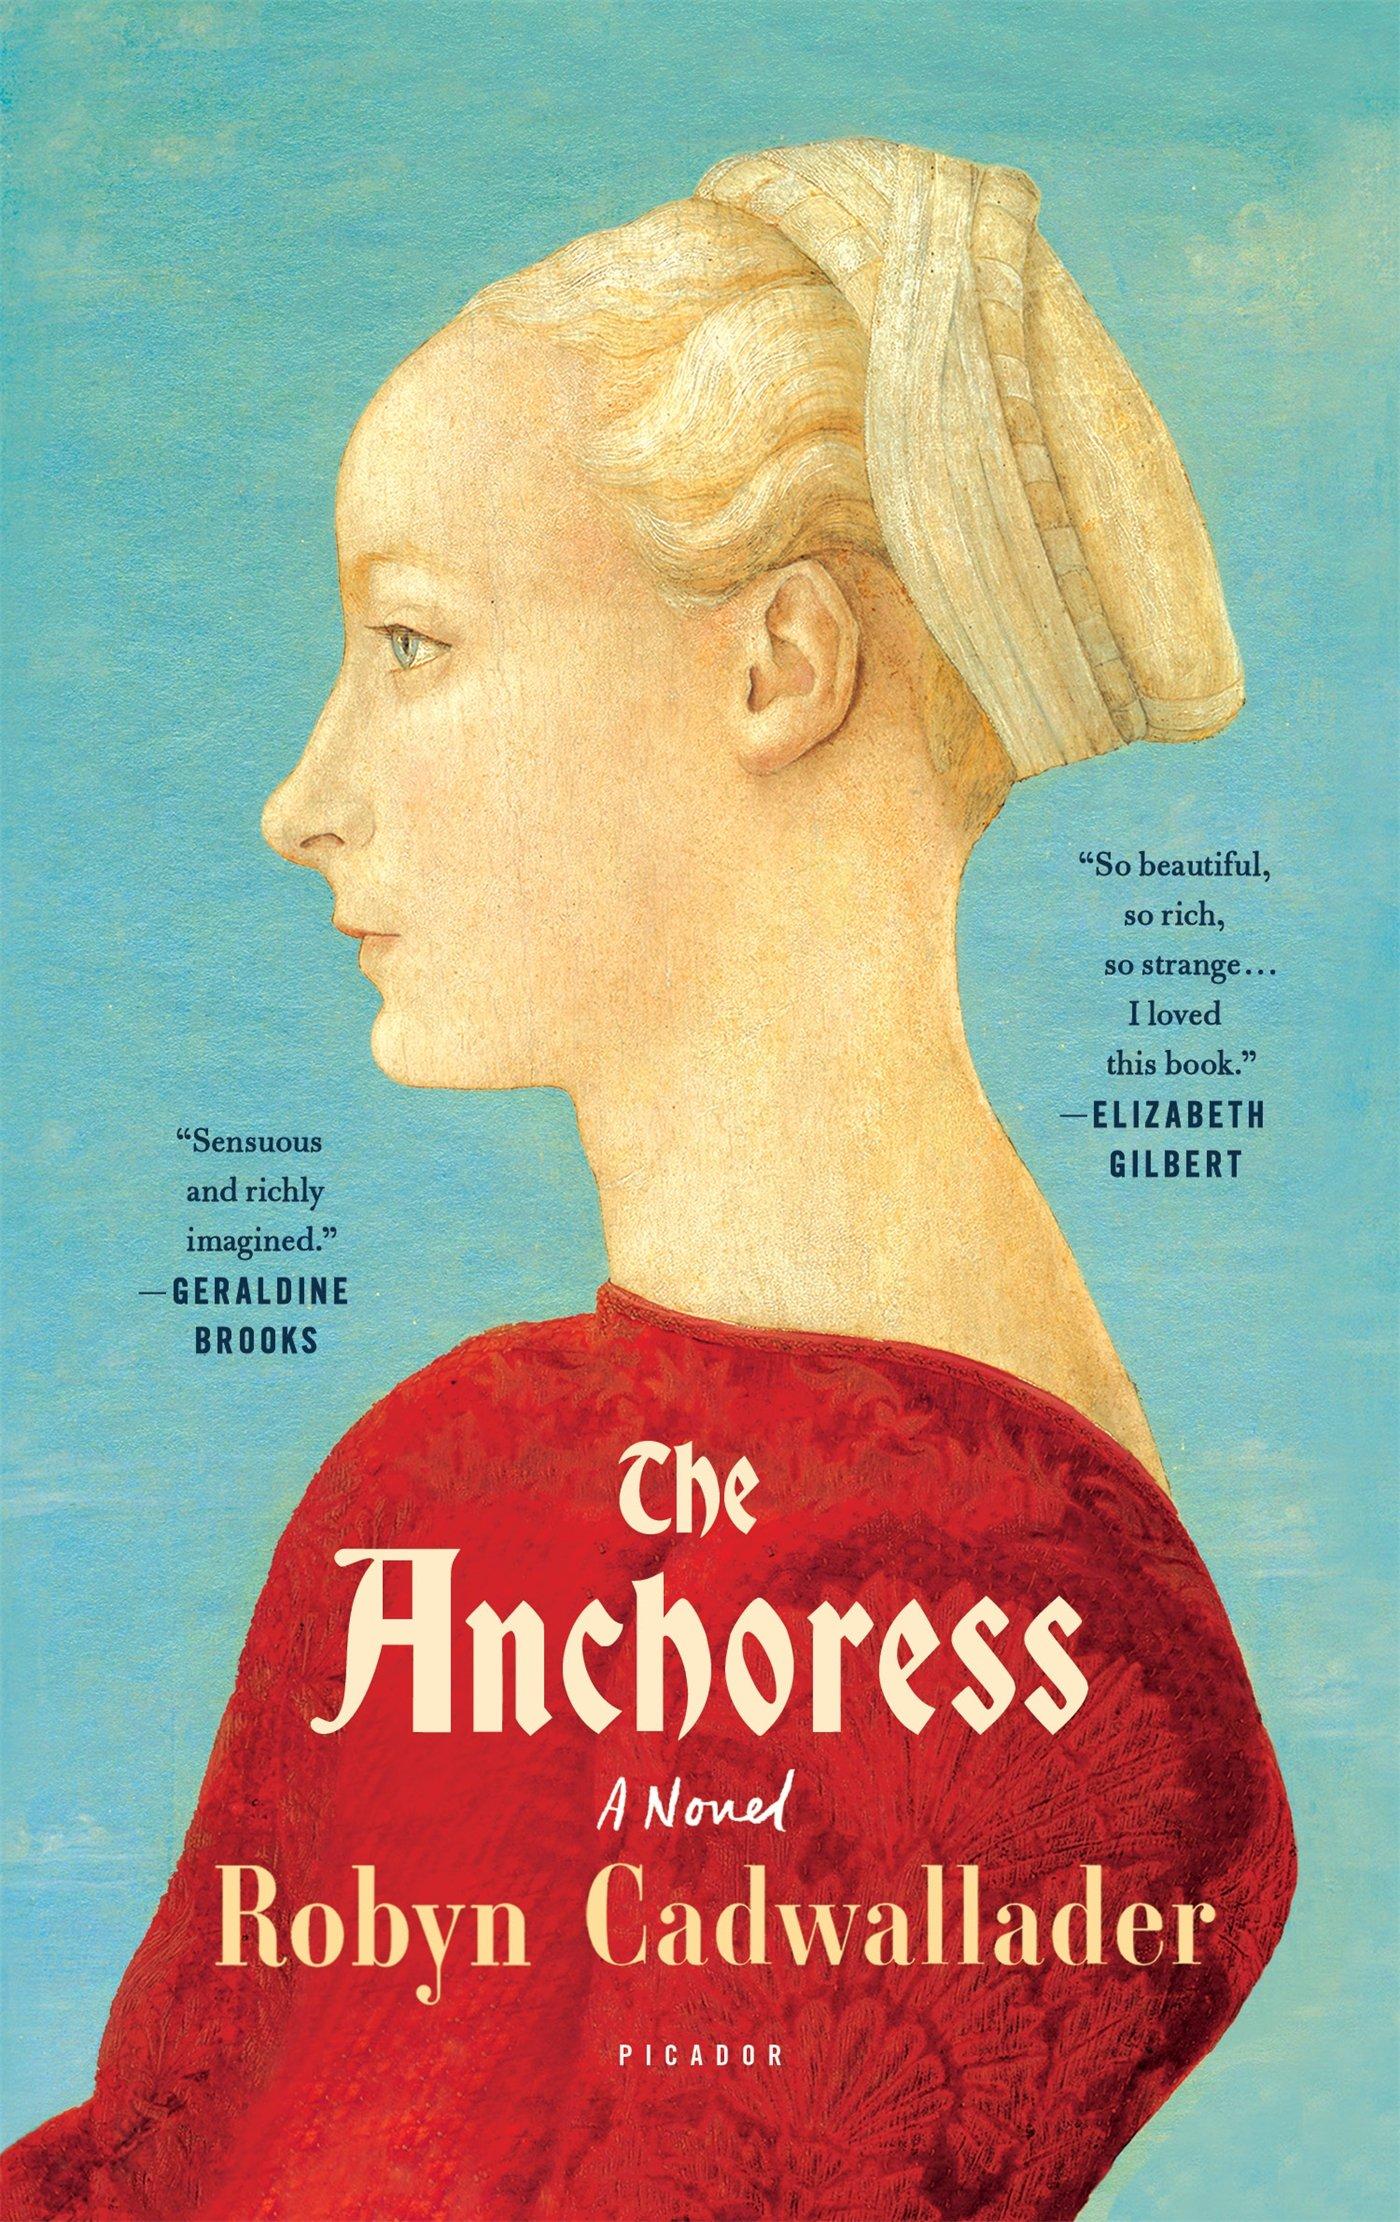 The Anchoress: A Novel: Robyn Cadwallader: 9781250094674: Amazon: Books